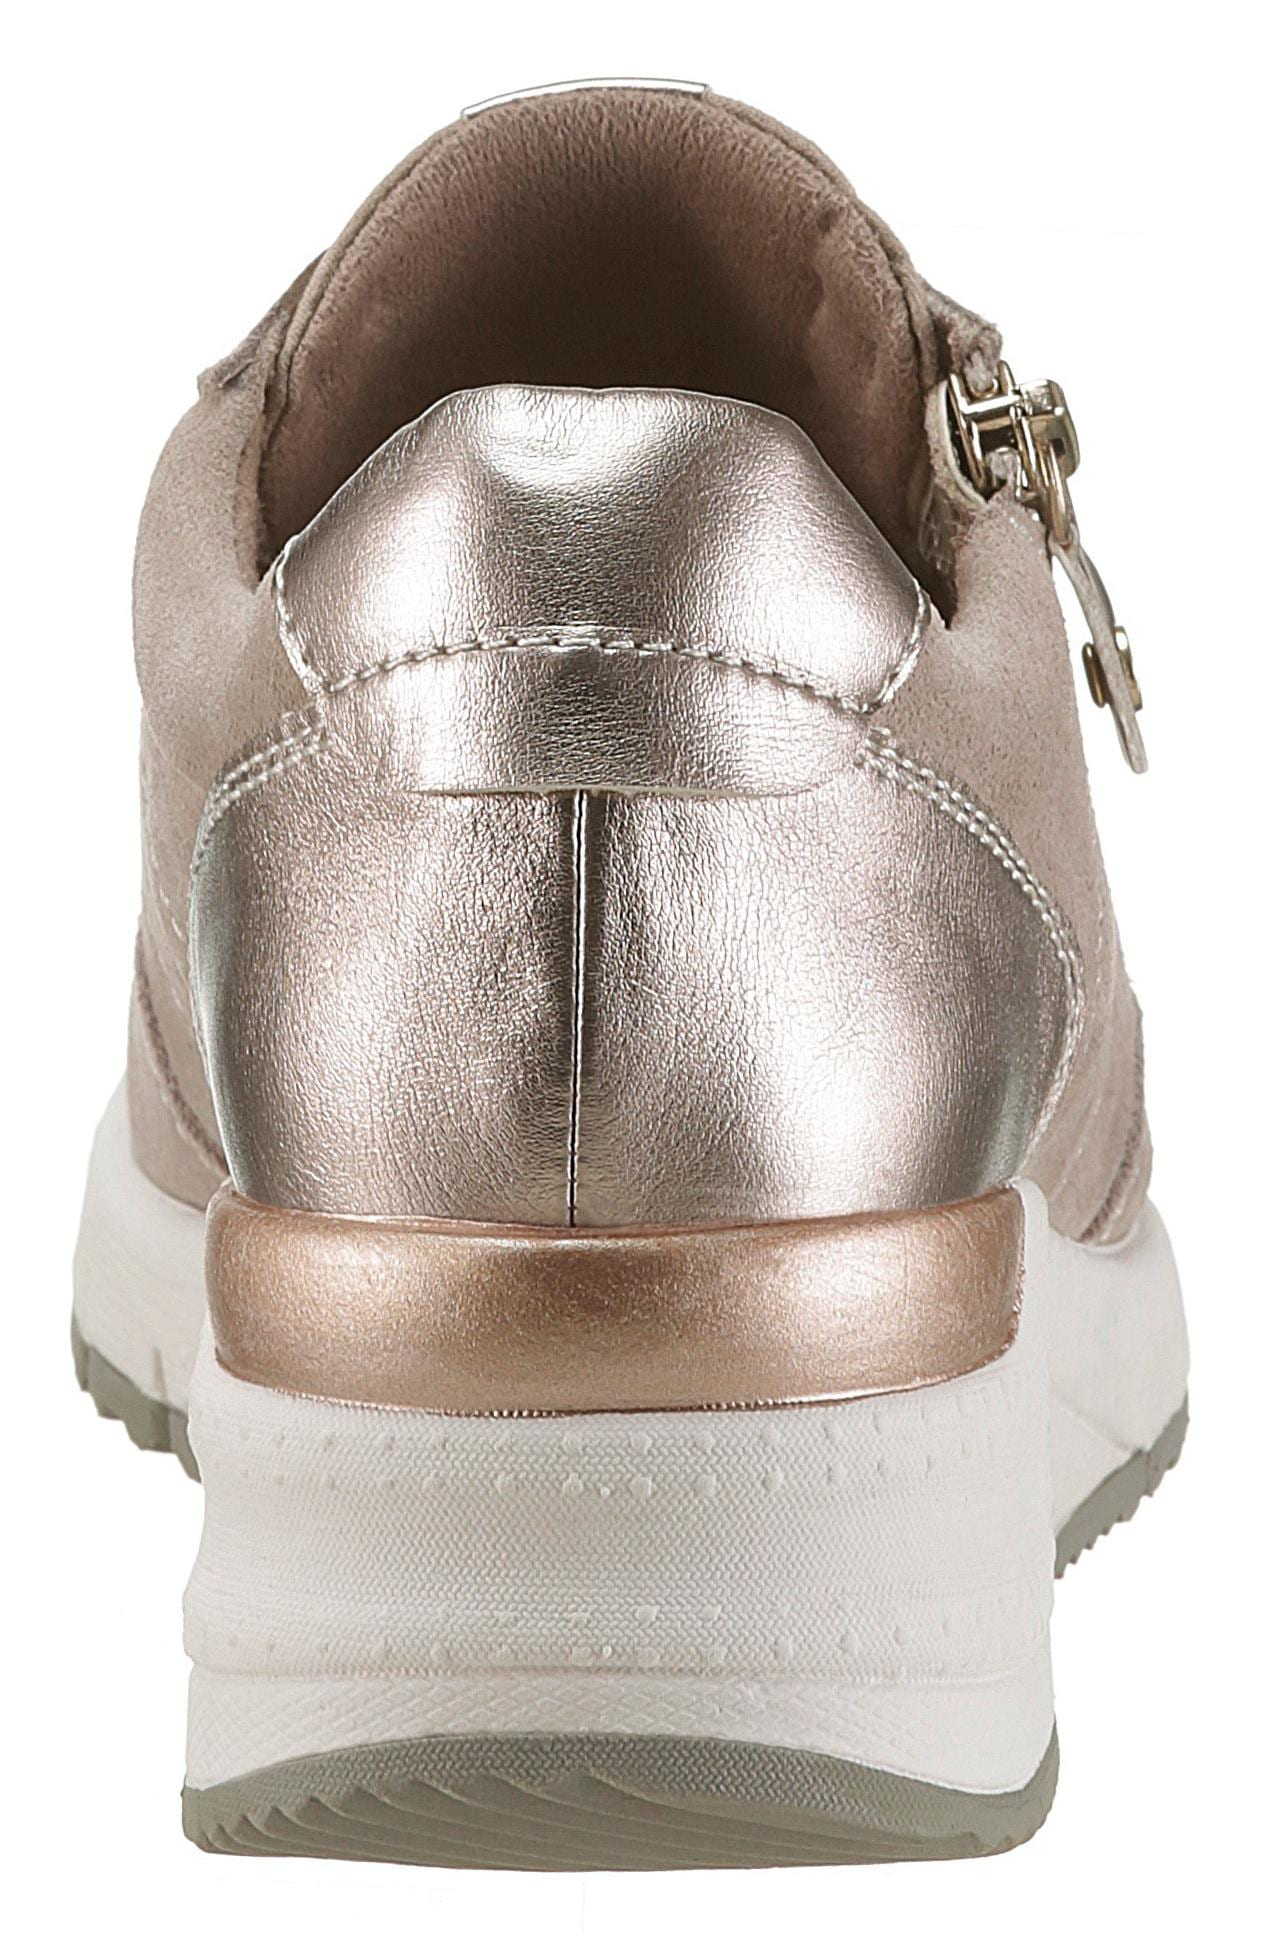 Schuhe Keilsneaker Damenmode Damen Rea Wedgesneaker Tamaris wOY0x